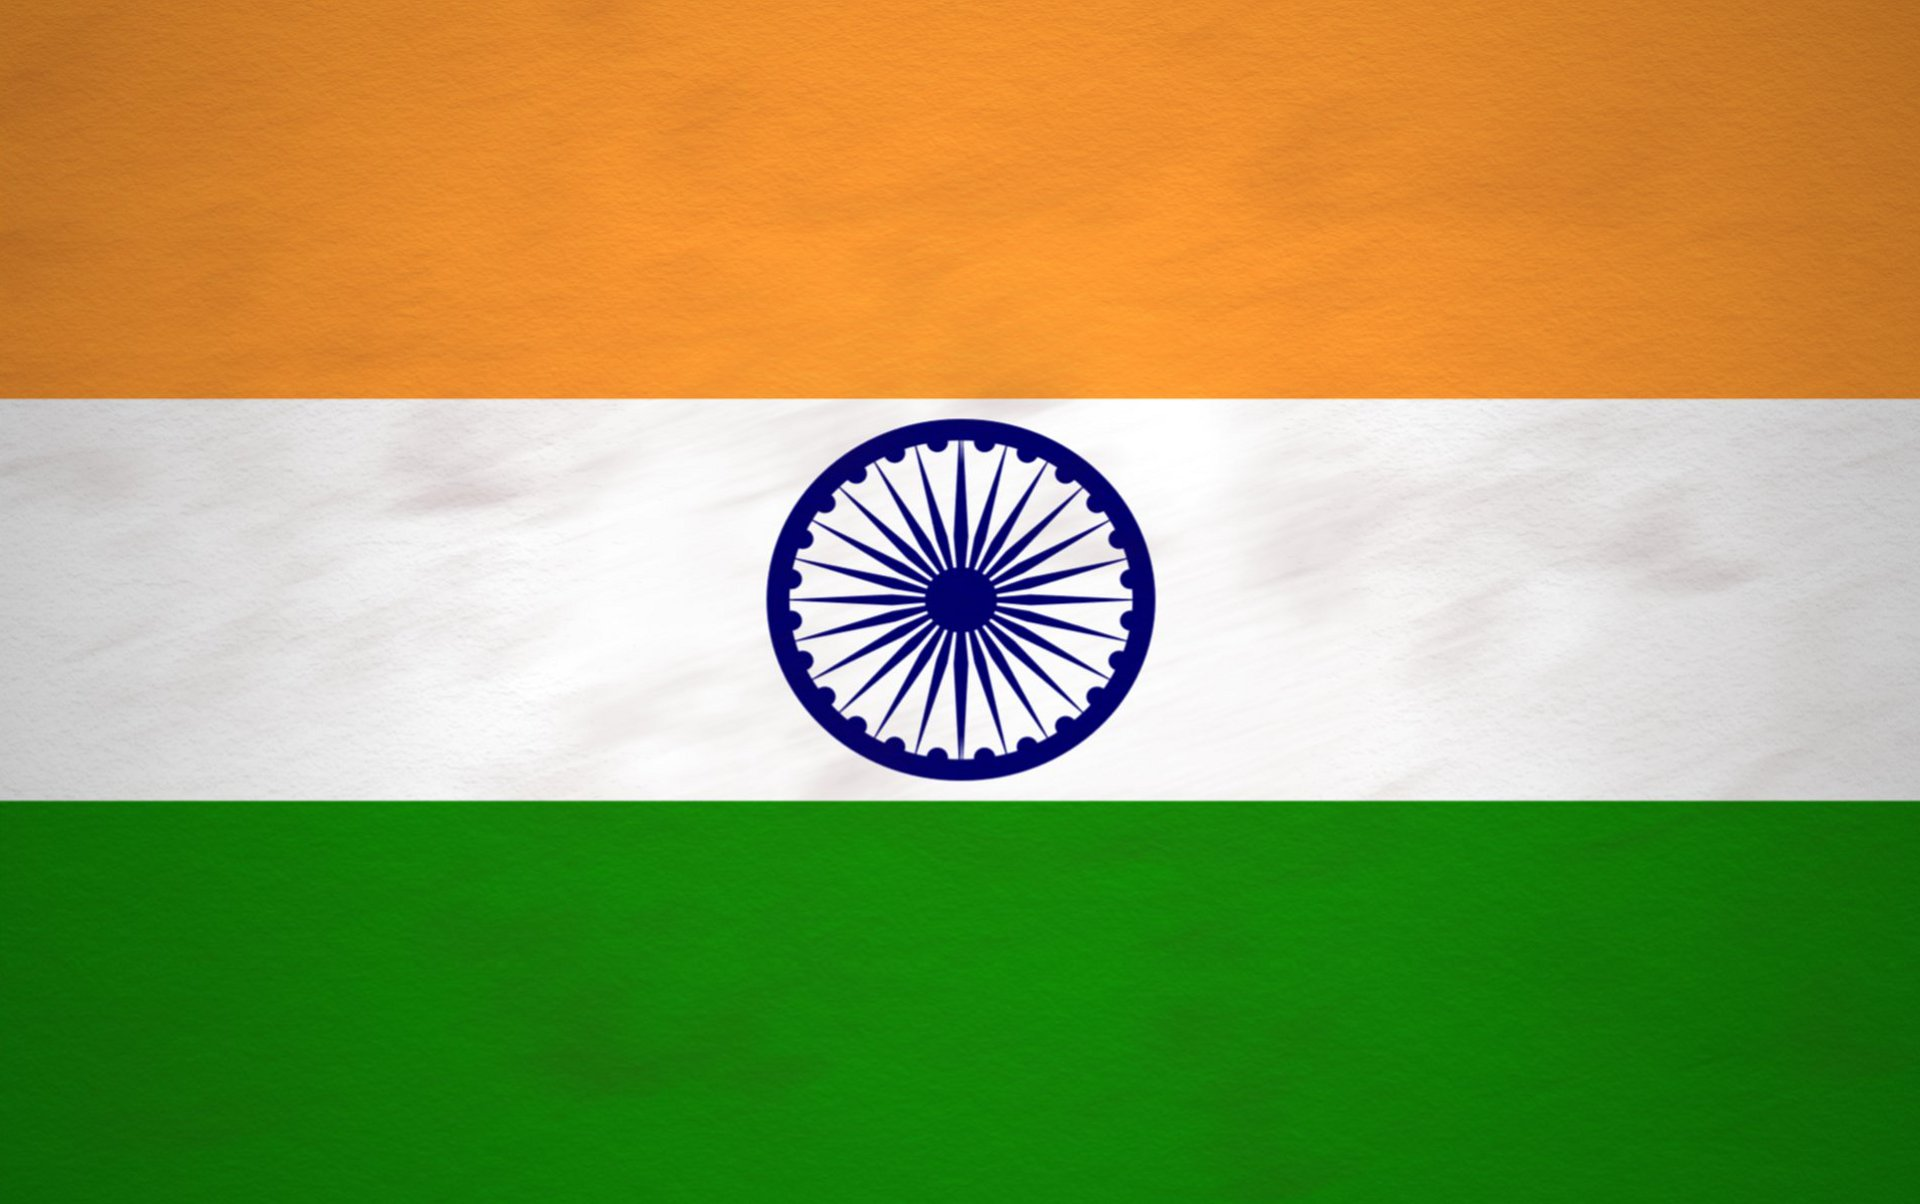 Indian Flag Hd Nature: India Wallpaper HD